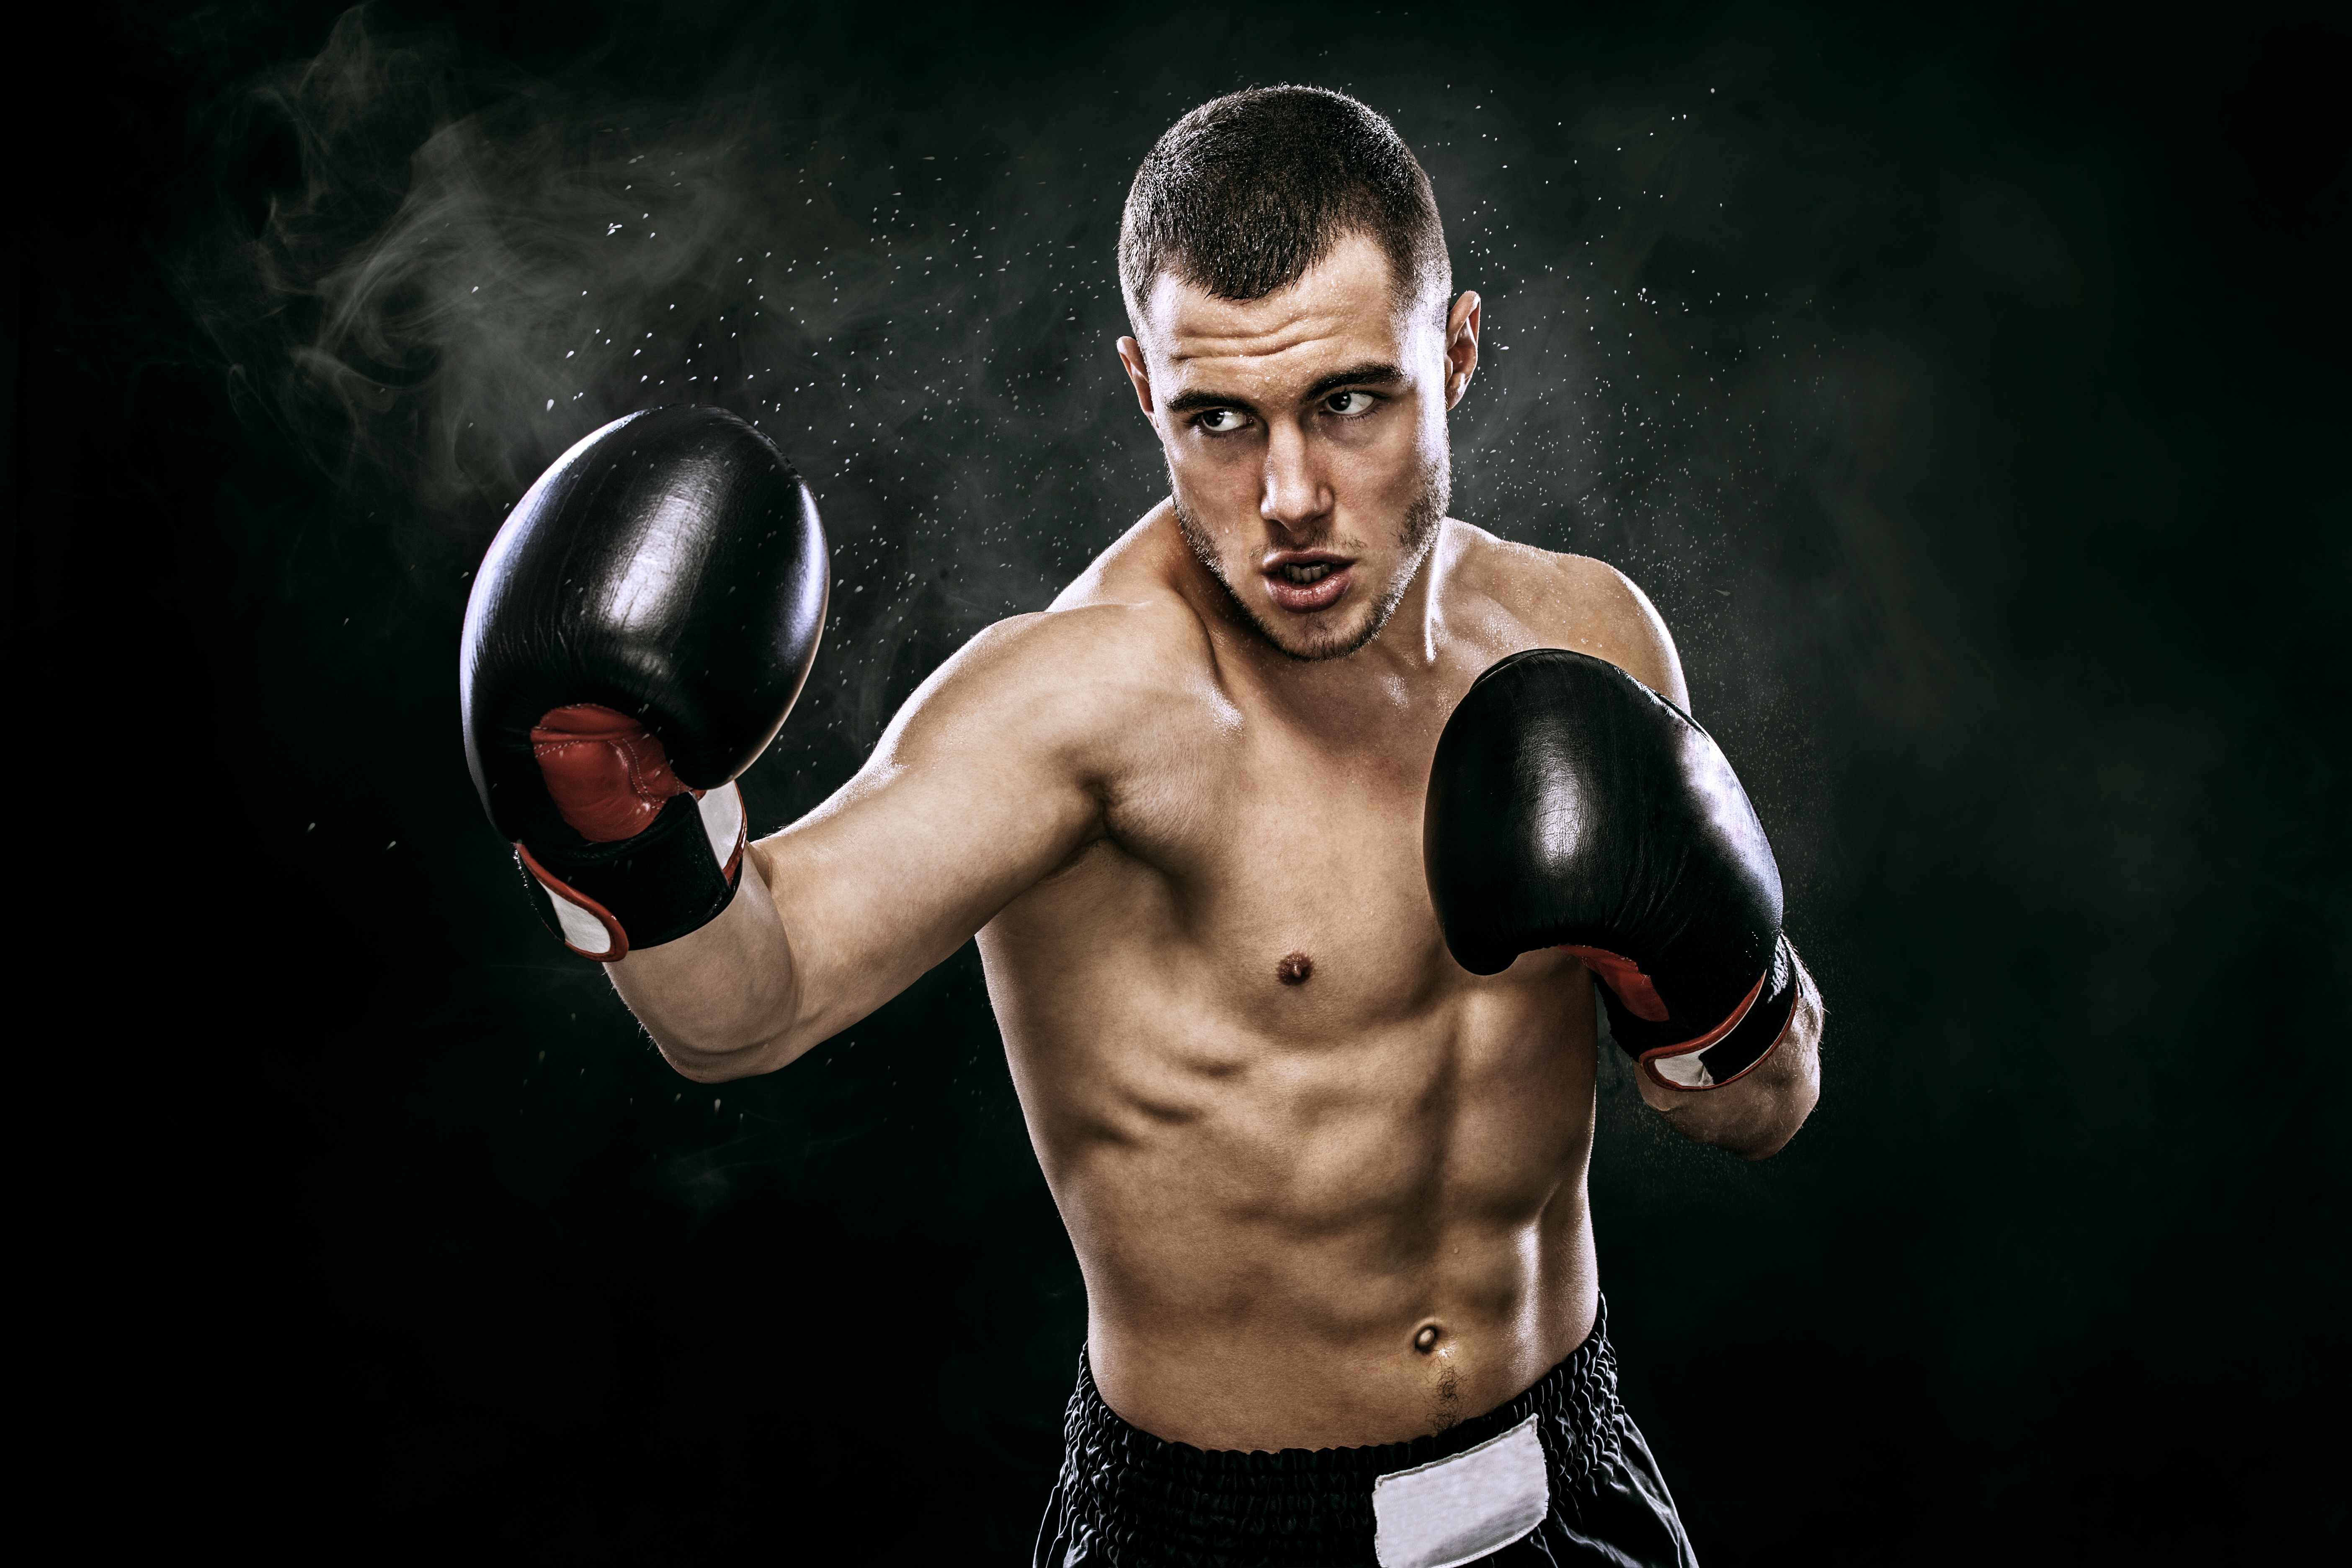 Boxe gorilla sports